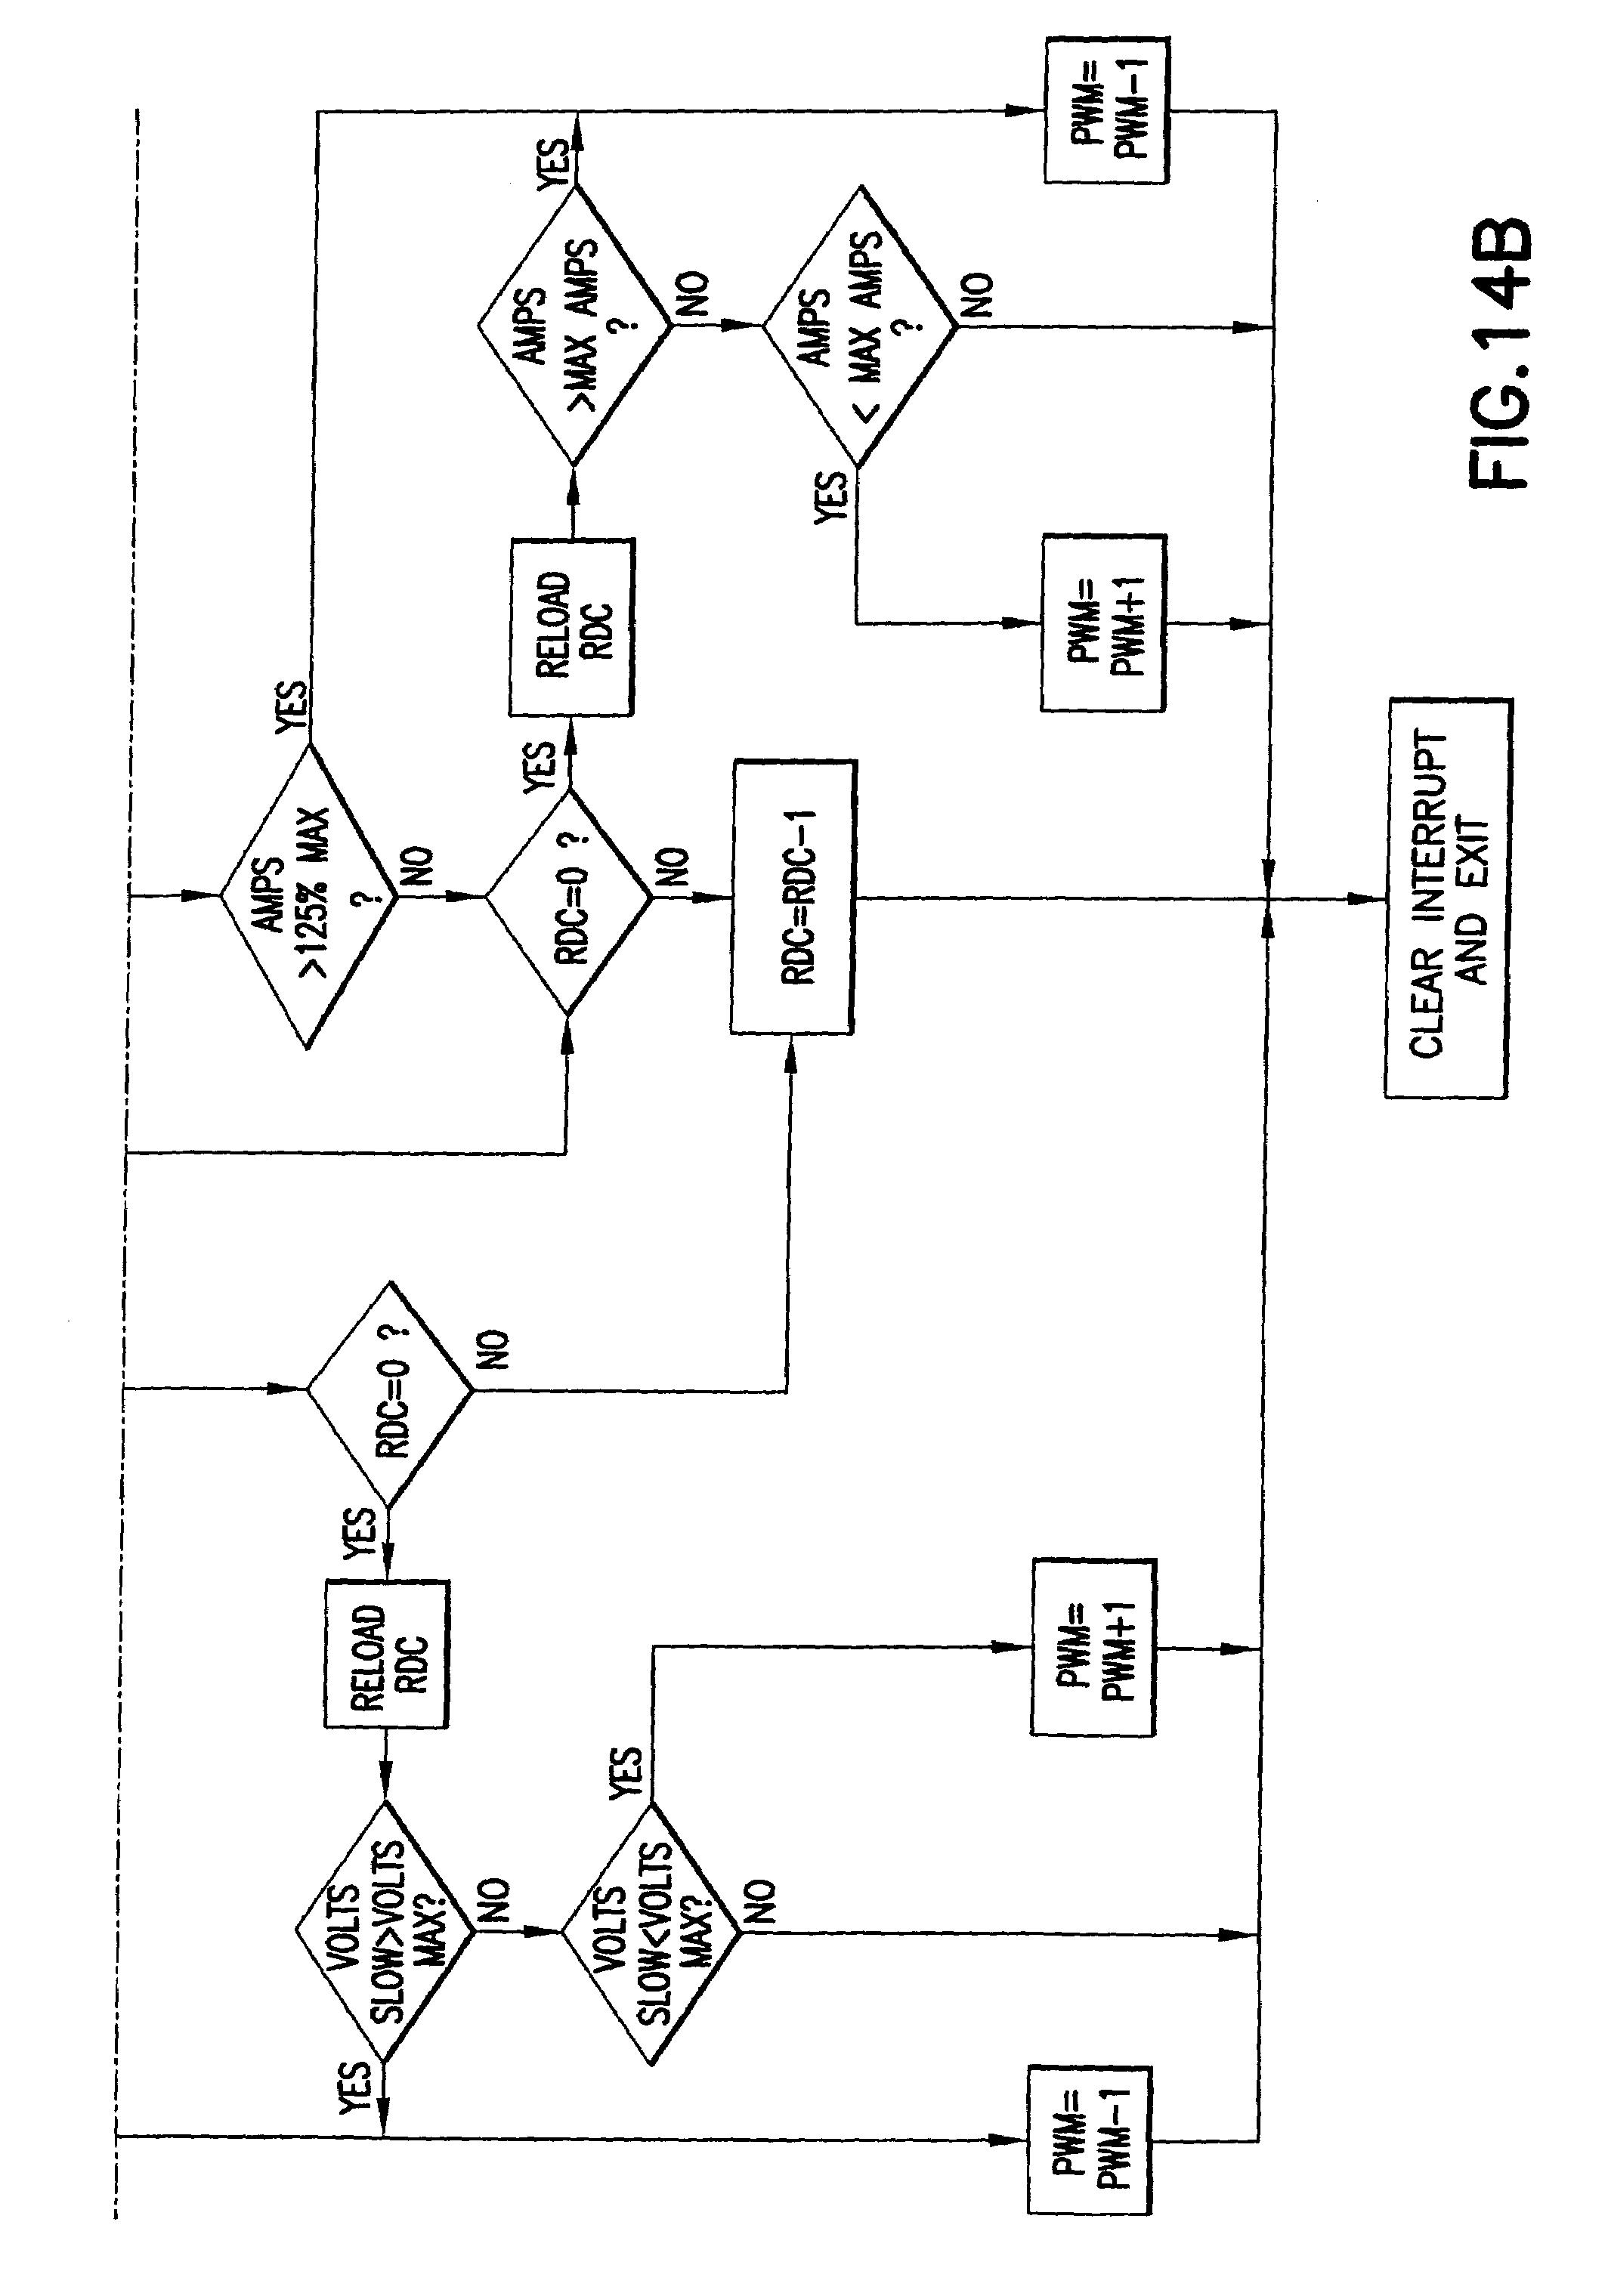 1984 Ez Go Engine Diagram Html ImageResizerTool Com